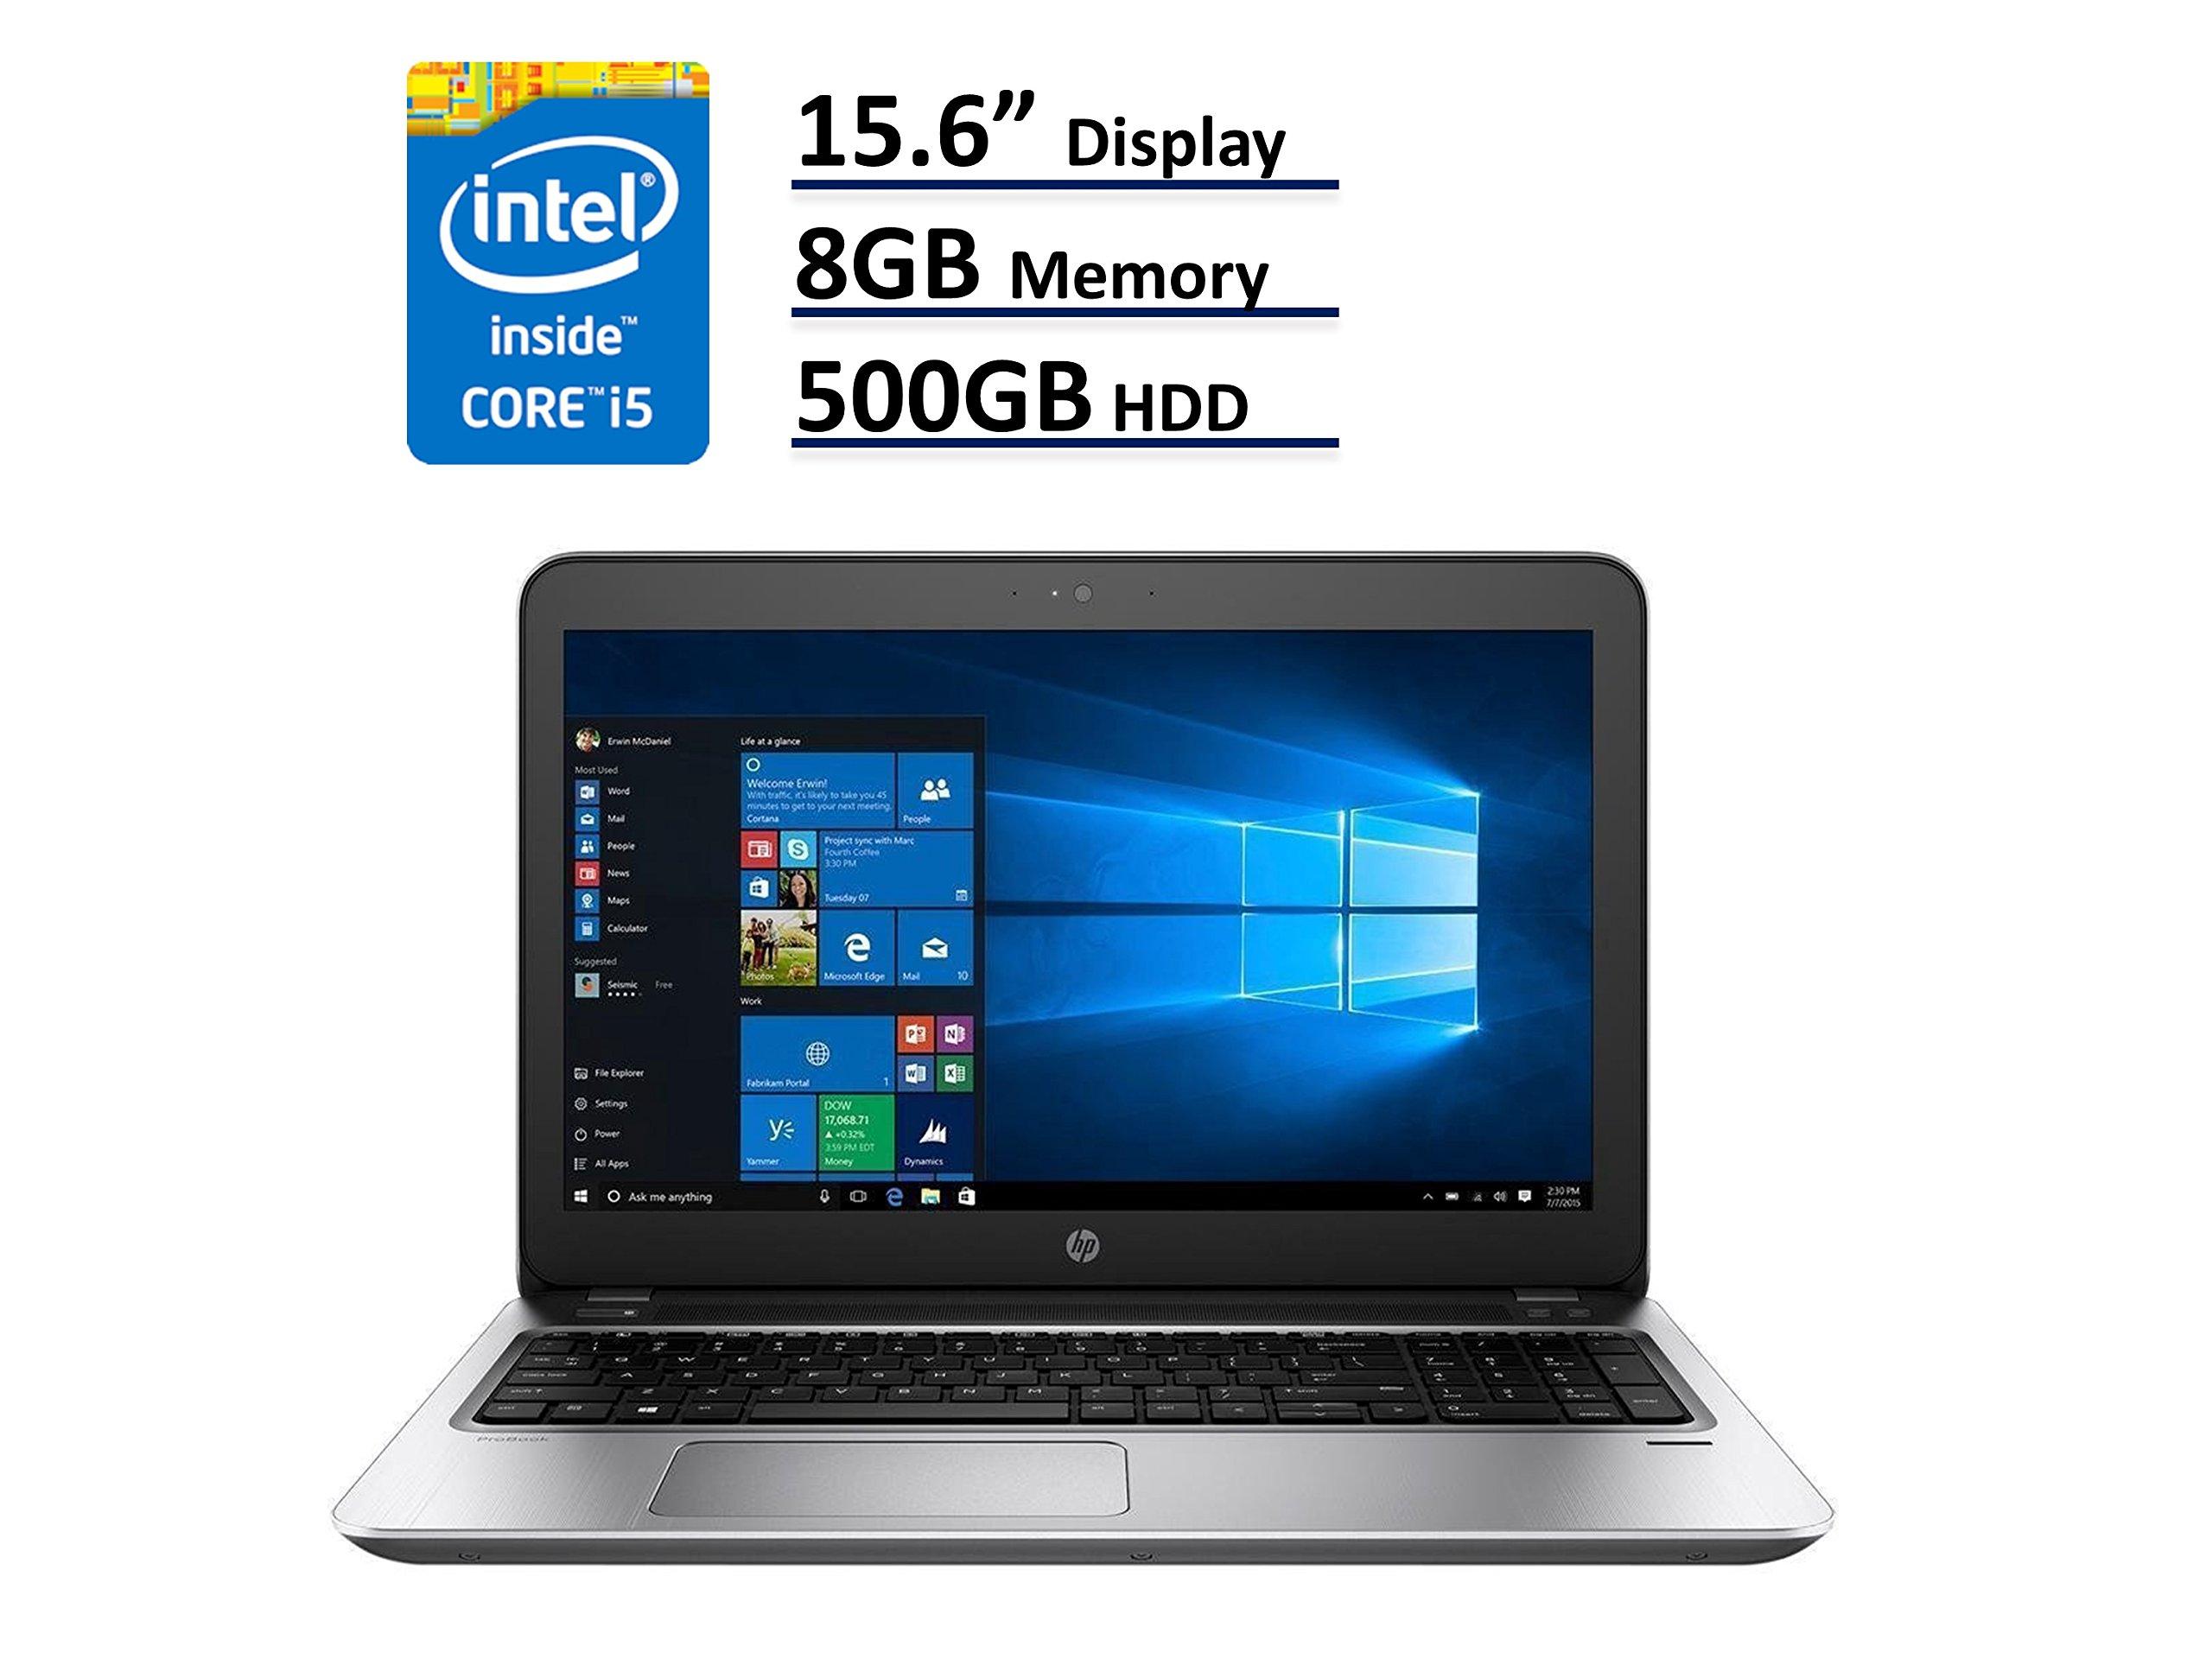 2017 HP ProBook 450 G4 Business Ultrabook Laptop: 15.6-Inch (1366x768)   Intel Core i5-7200U   500GB HDD   8GB DDR4   DVD-RW   Windows 10 Home